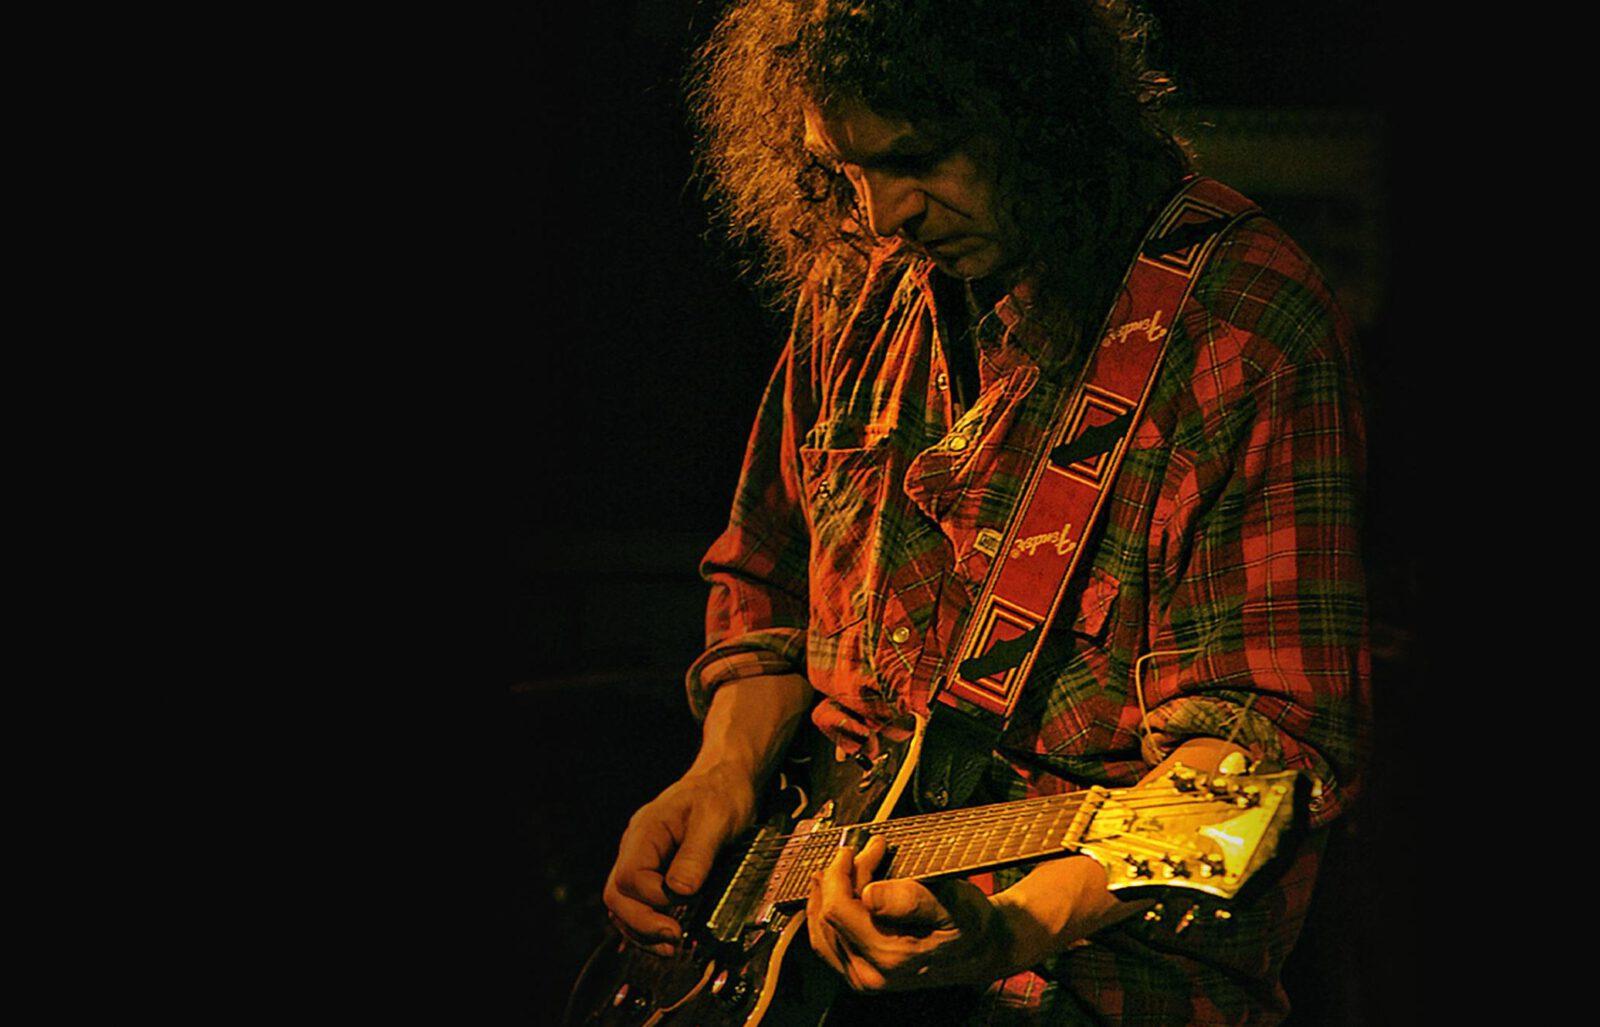 Jed Thomas & Band